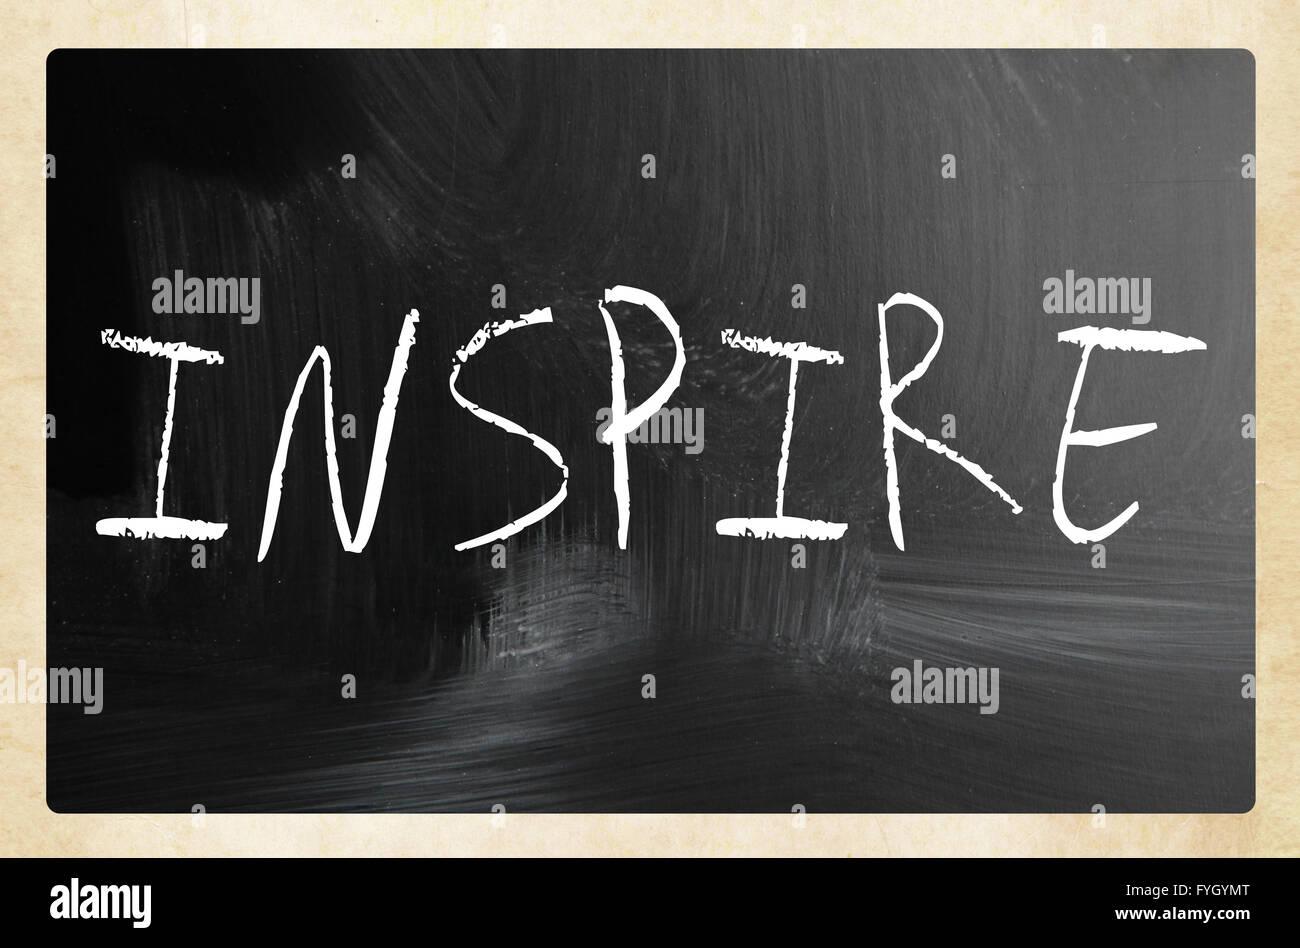 Inspire handwritten with white chalk on a blackboard - Stock Image